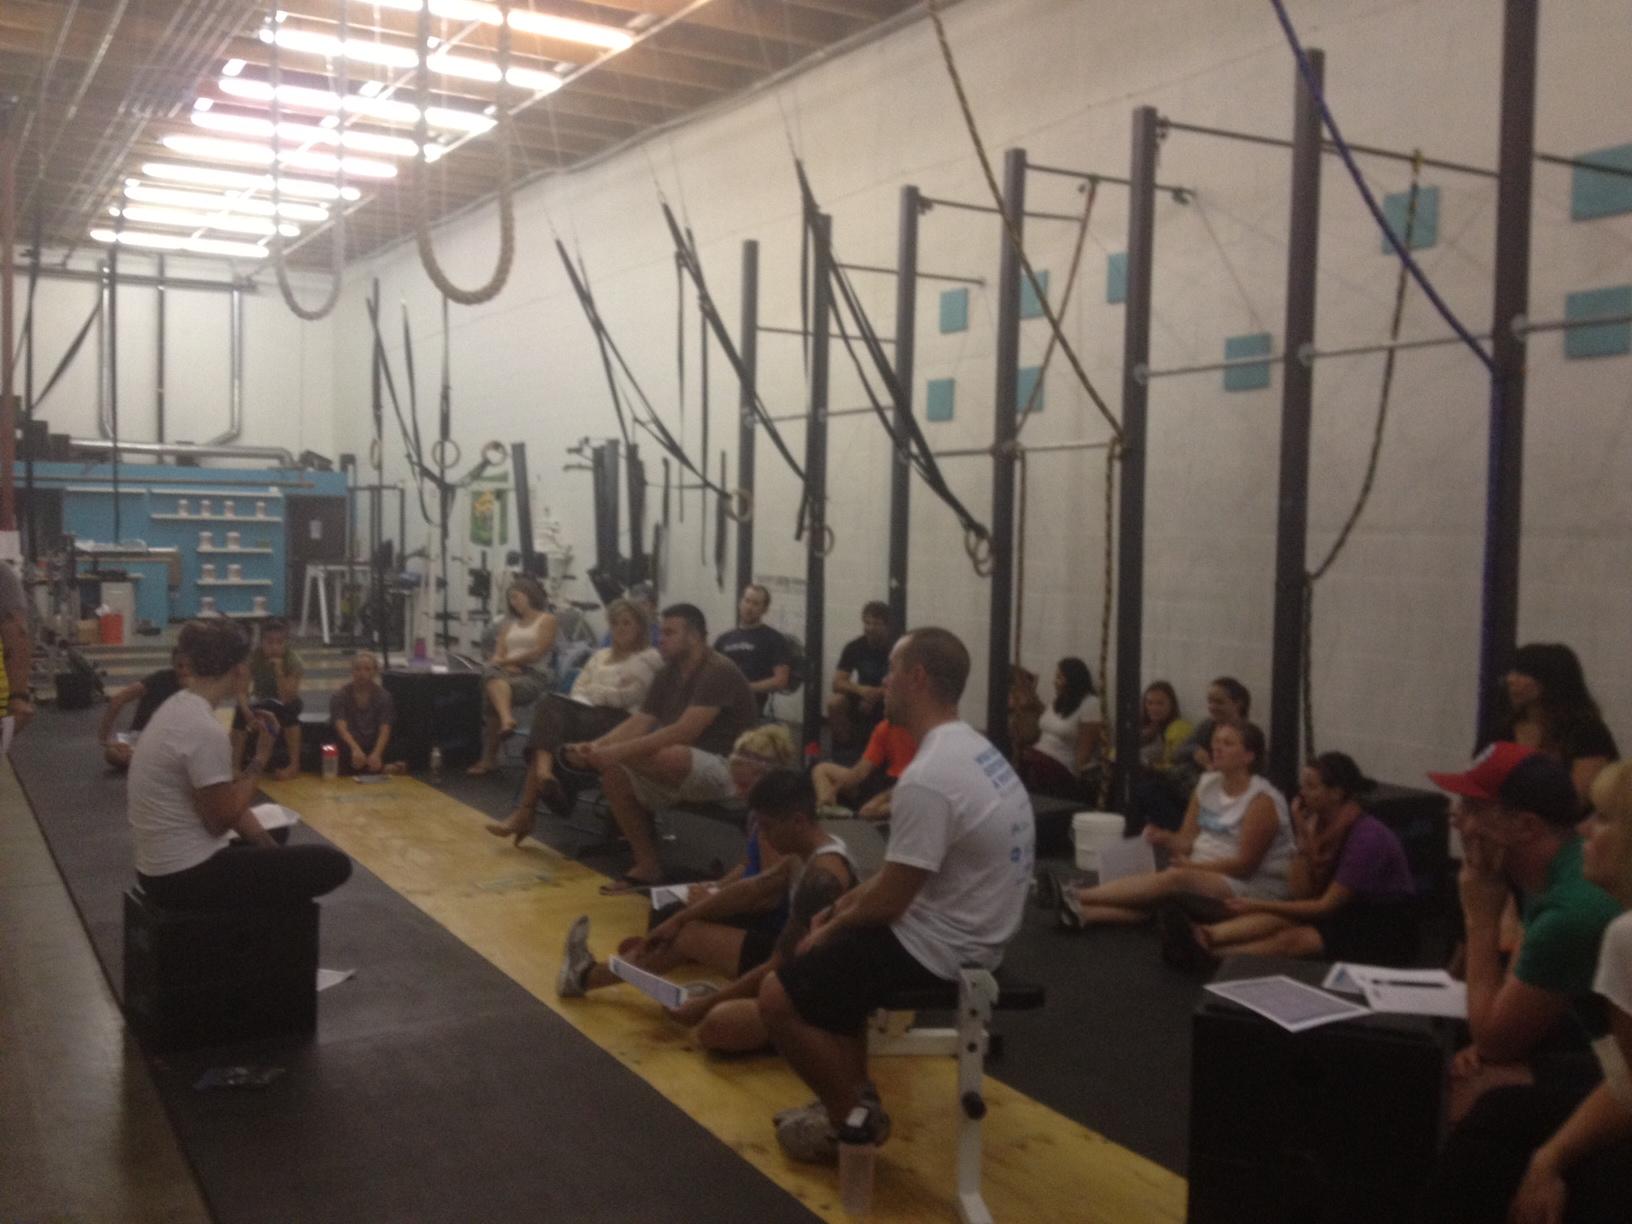 Paleo Diet Seminar at CrossFit Elevation